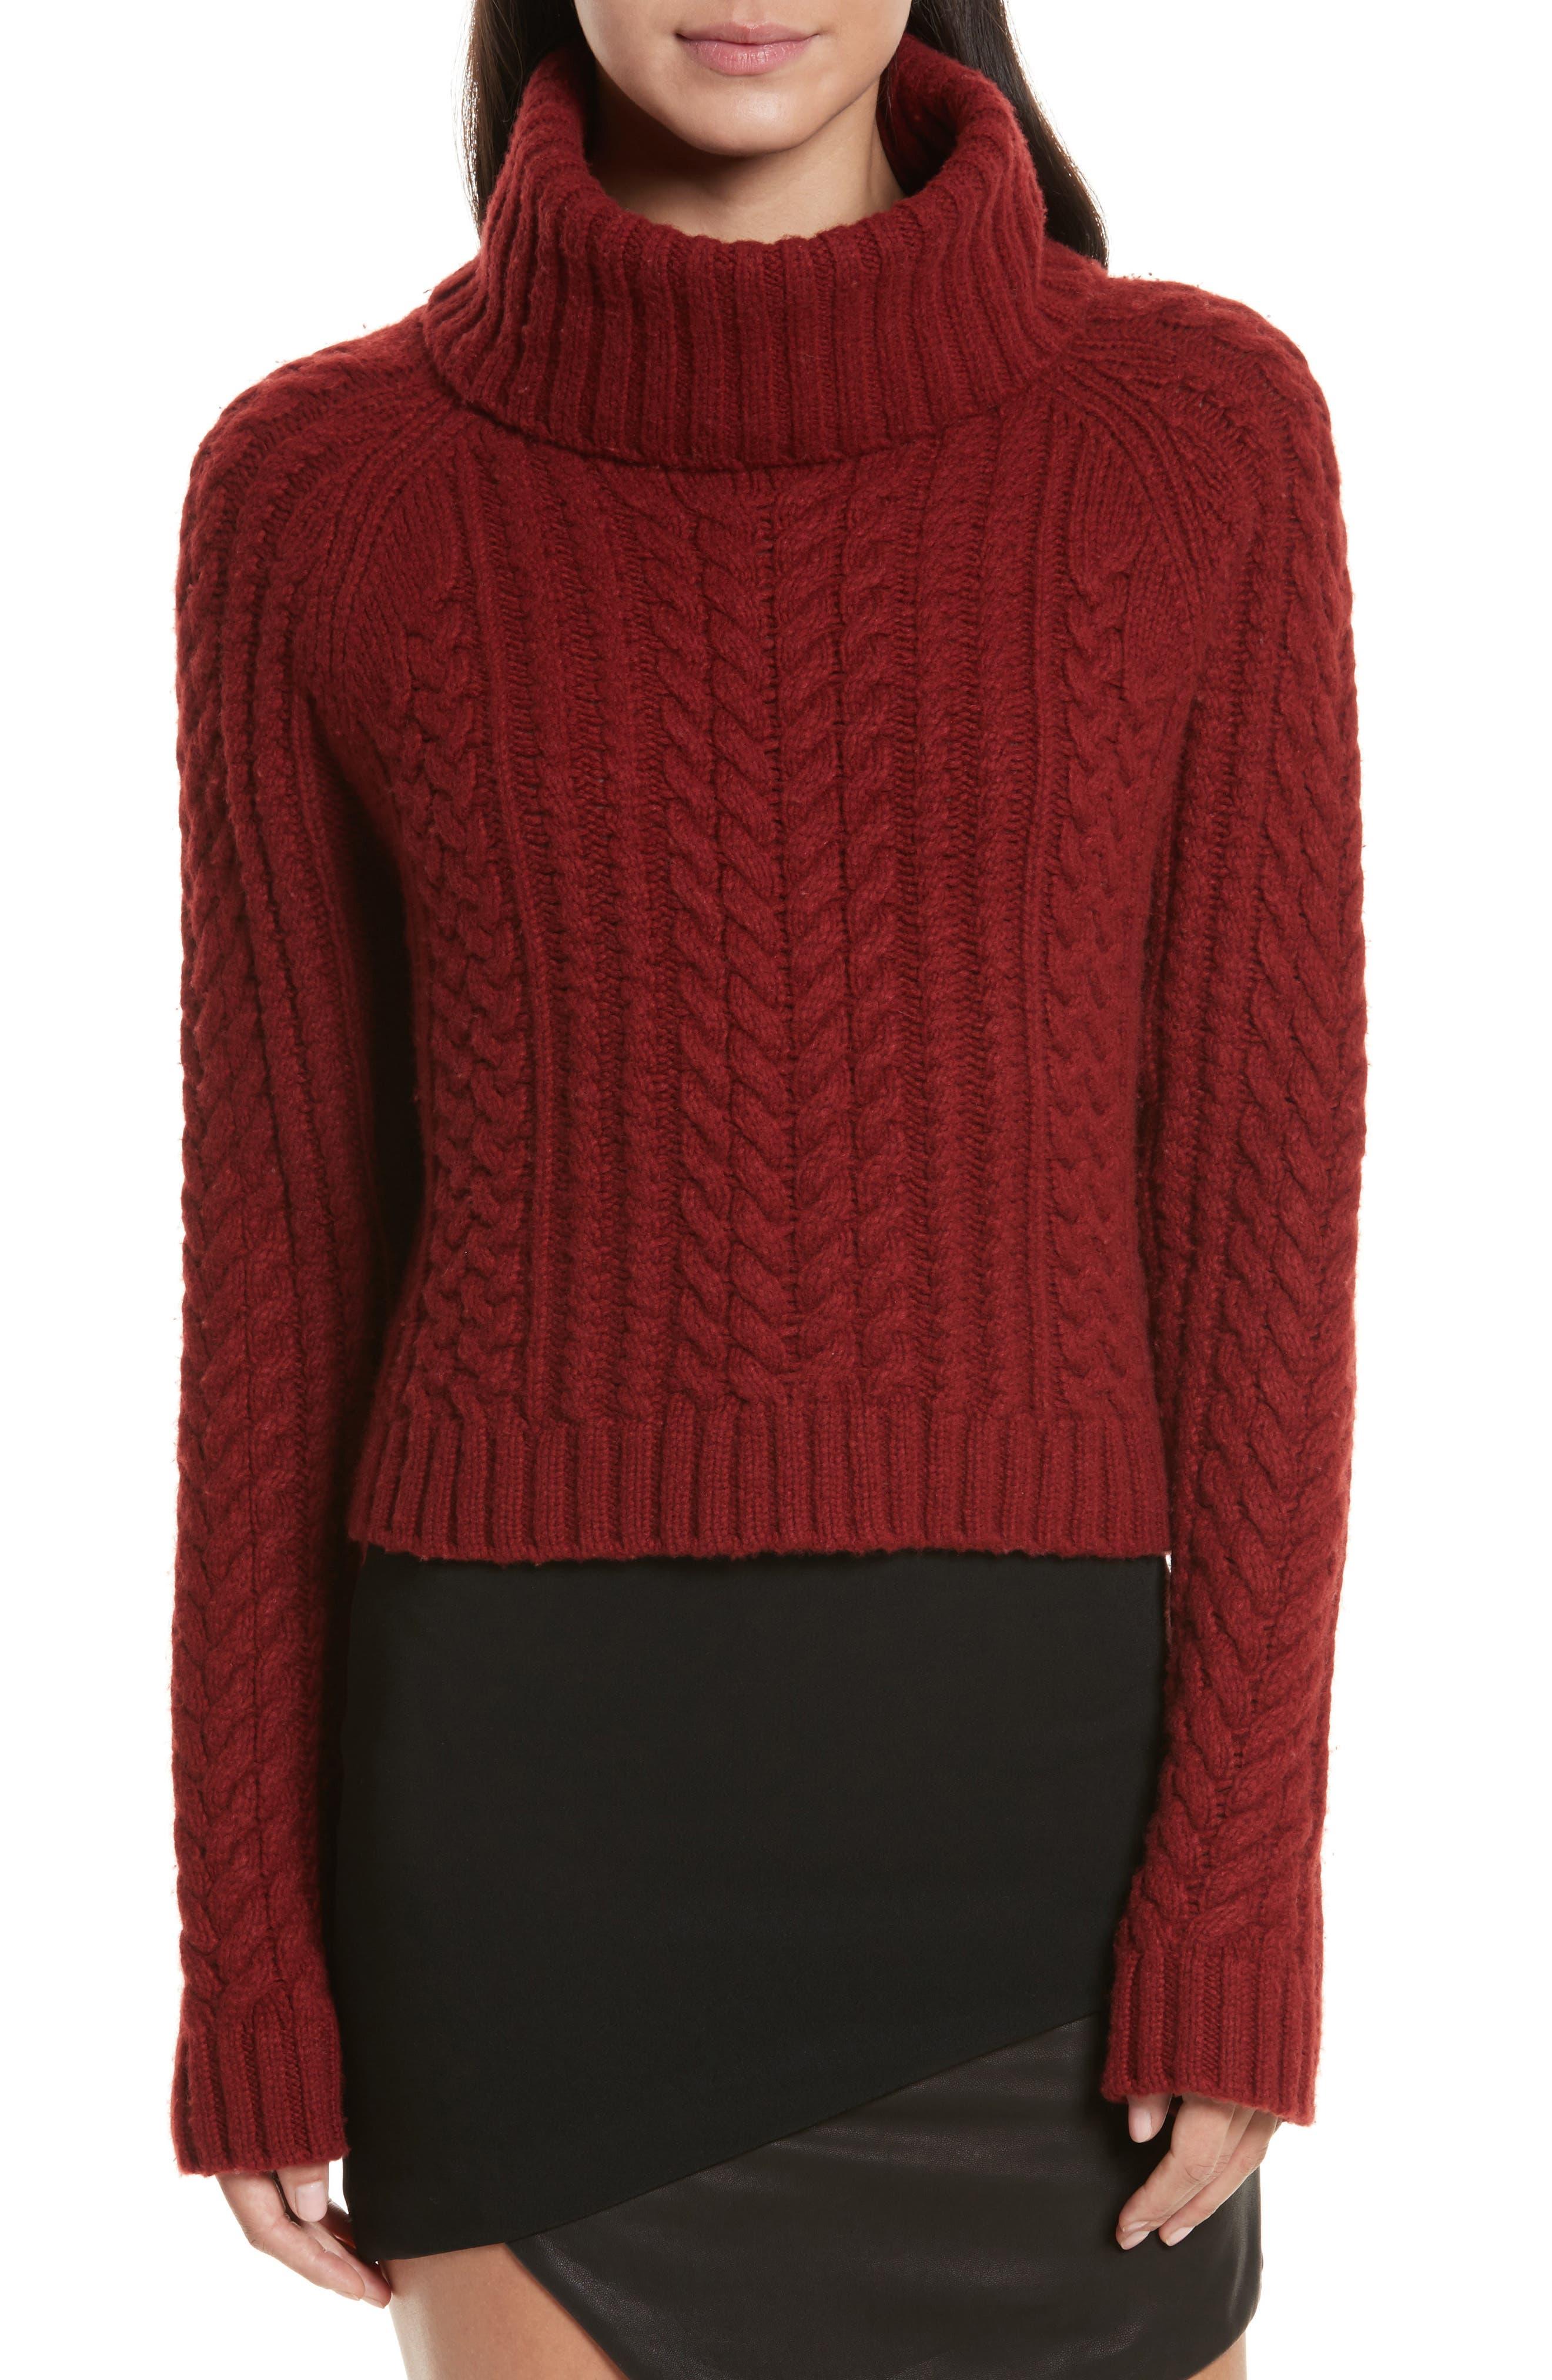 Alternate Image 1 Selected - Alice + Olivia Tobin Cable Knit Crop Turtleneck Sweater